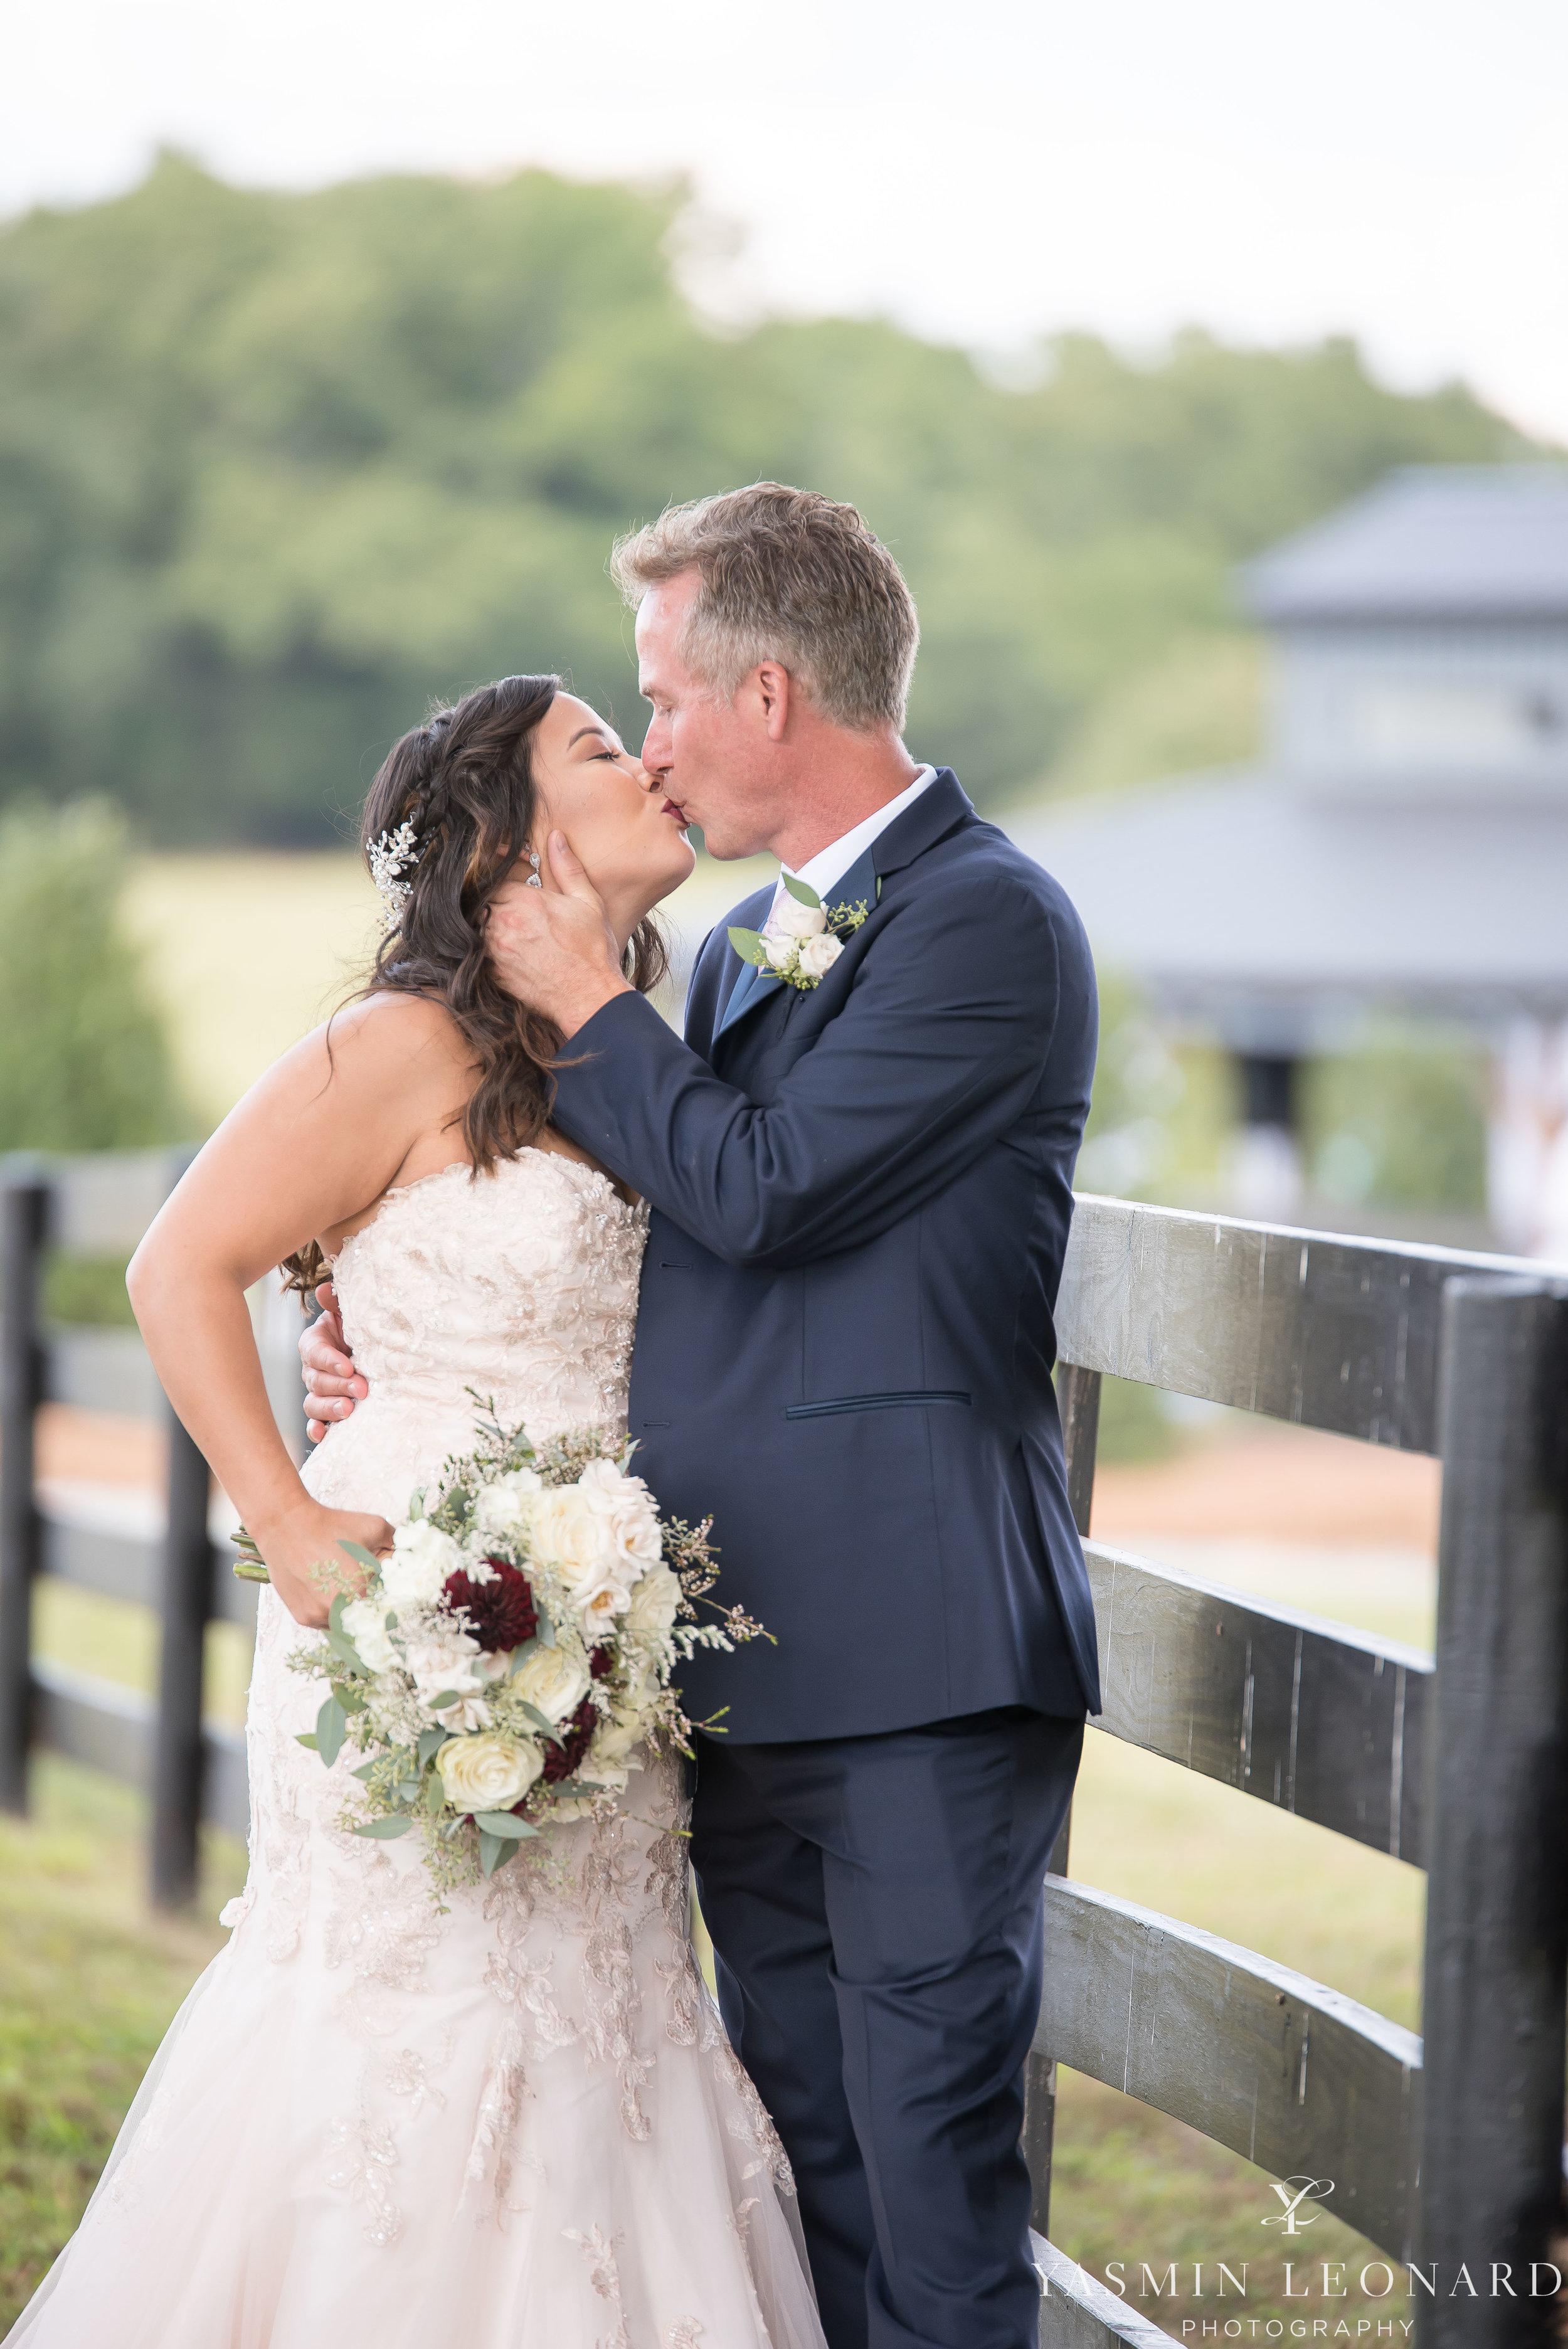 Mason Ridge   Liberty, NC   Aylissa and John   Yasmin Leonard Photography-41.jpg